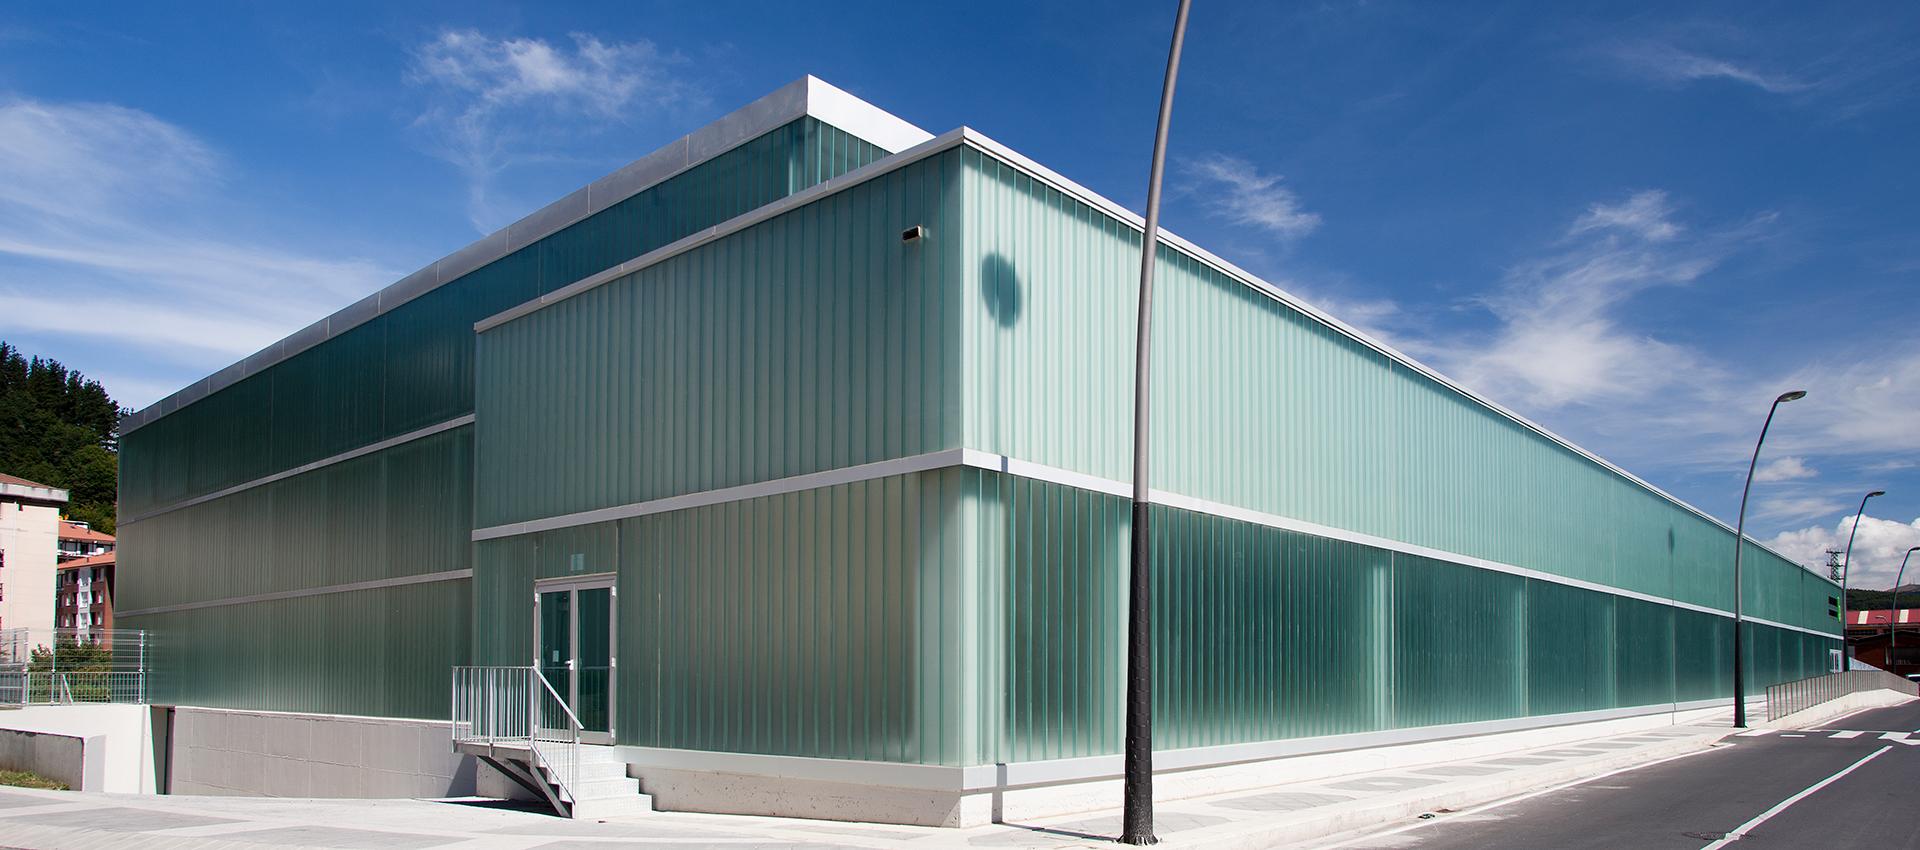 Outside view of Sport Cter. by HIKA arkitektura. Photograph © Agustín Sagasti. Image courtesy of HIKA arkitektura